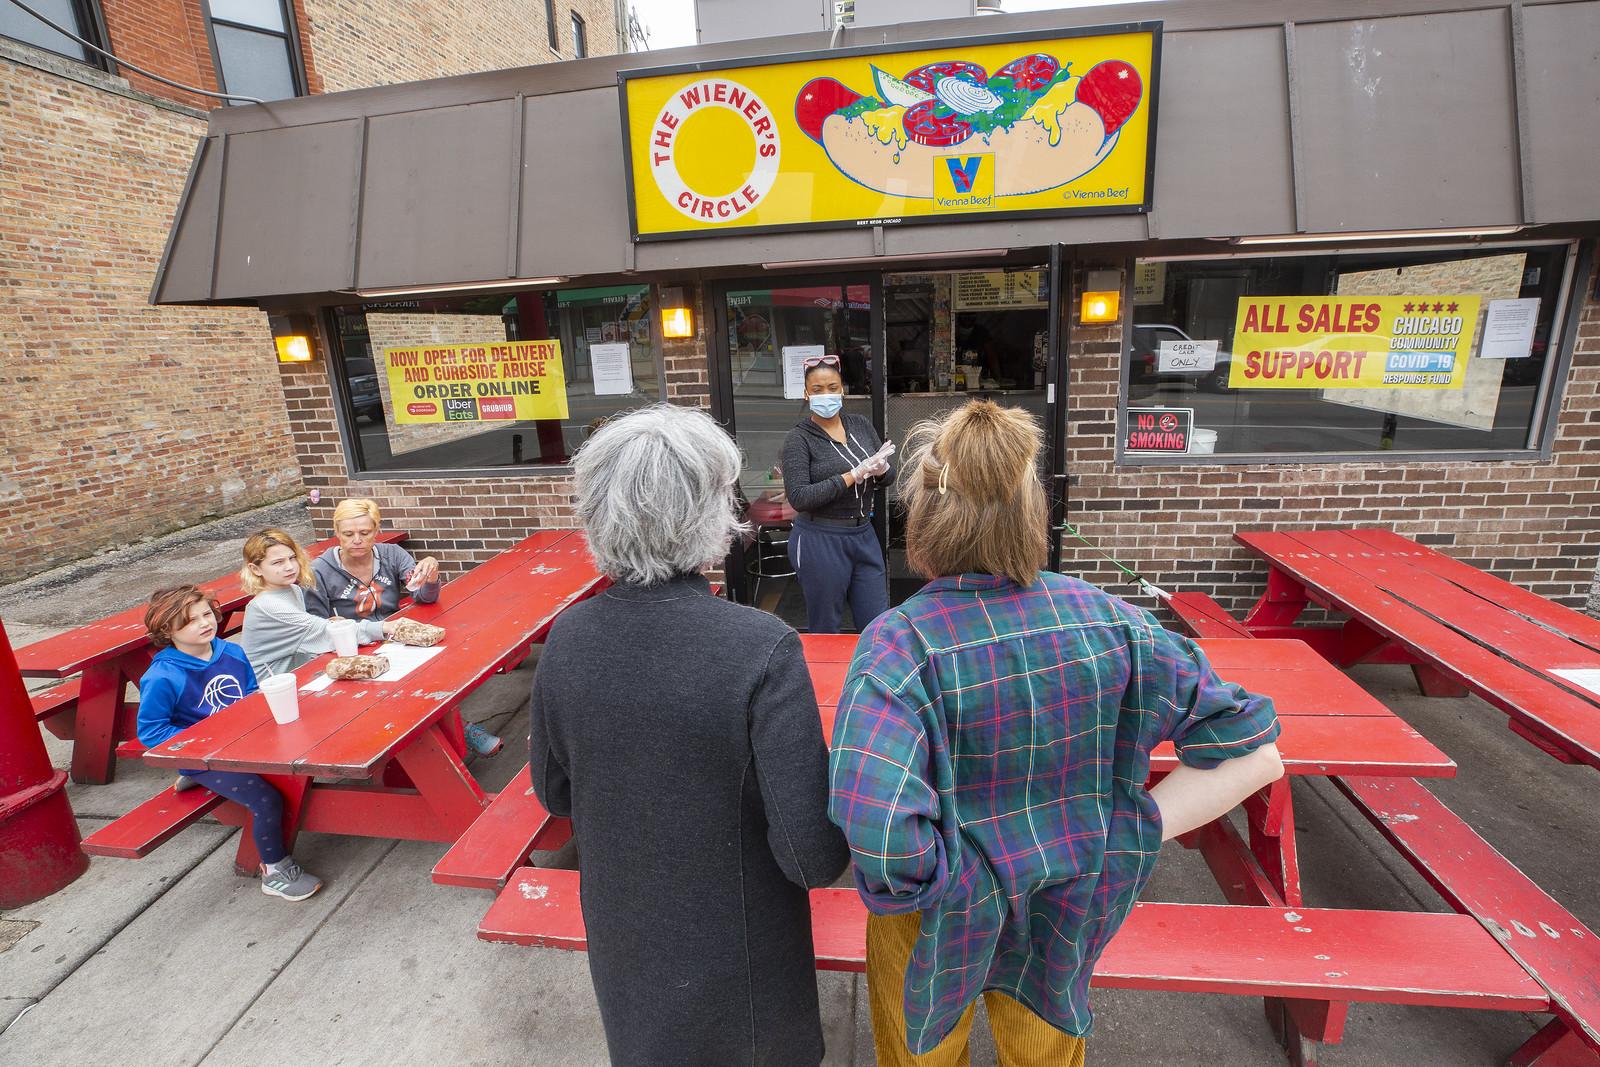 Wiener's circle chicago